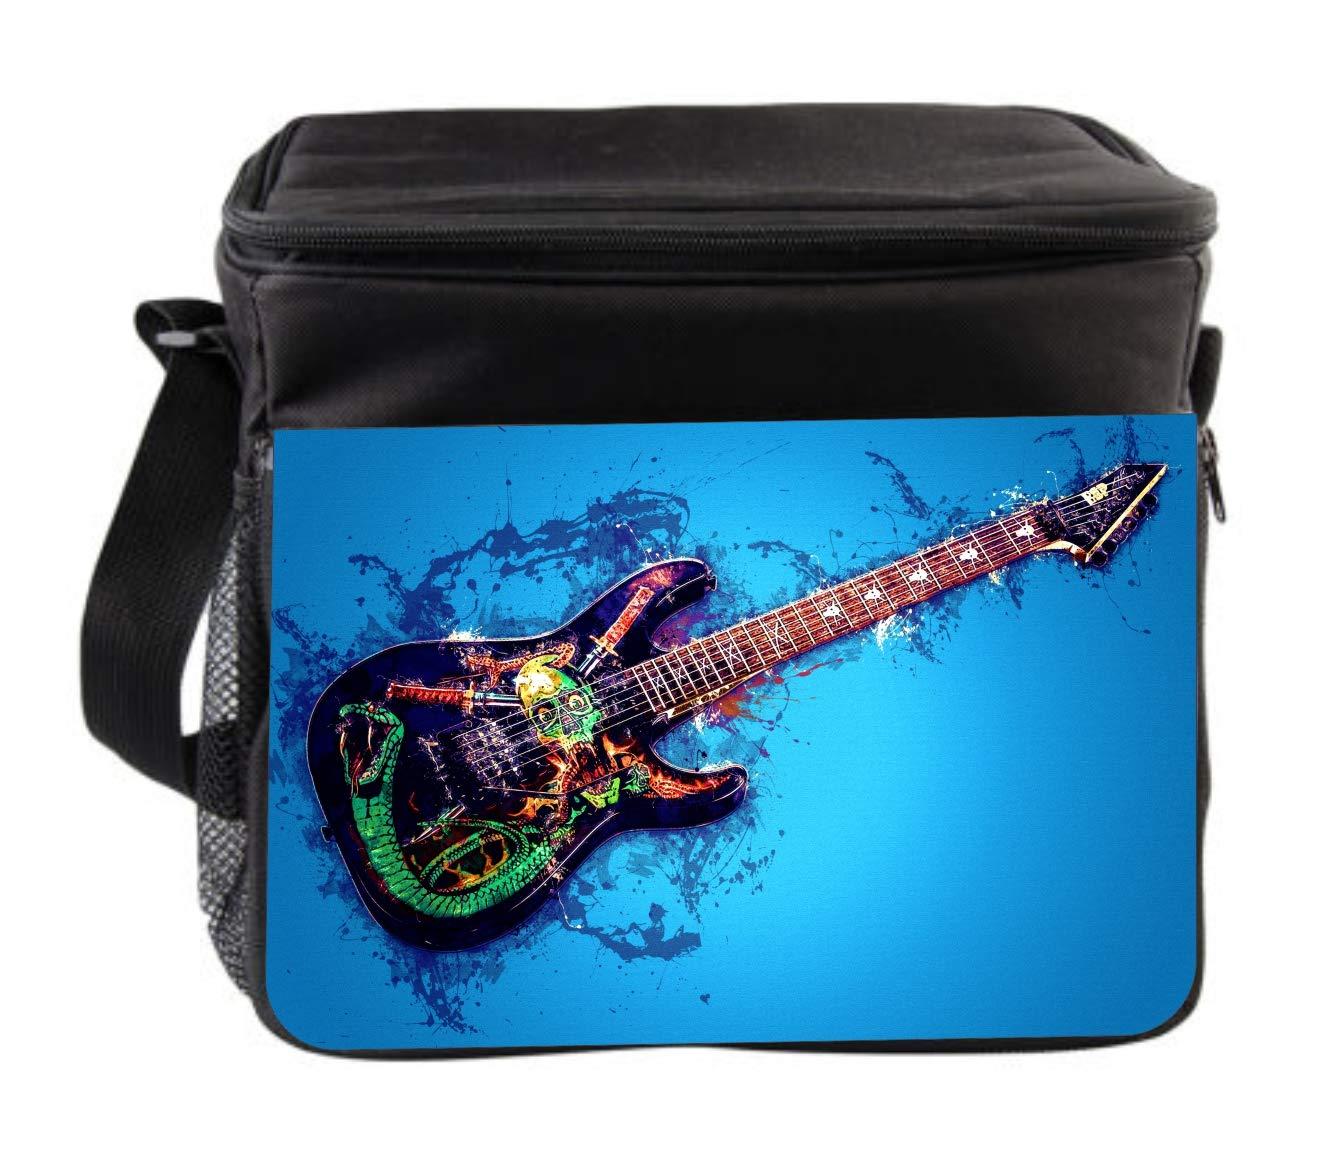 Rosie Parker Inc. Music Skull Guitar Cross Body Thermal Cooler Bag for Travel by Rosie Parker Inc.